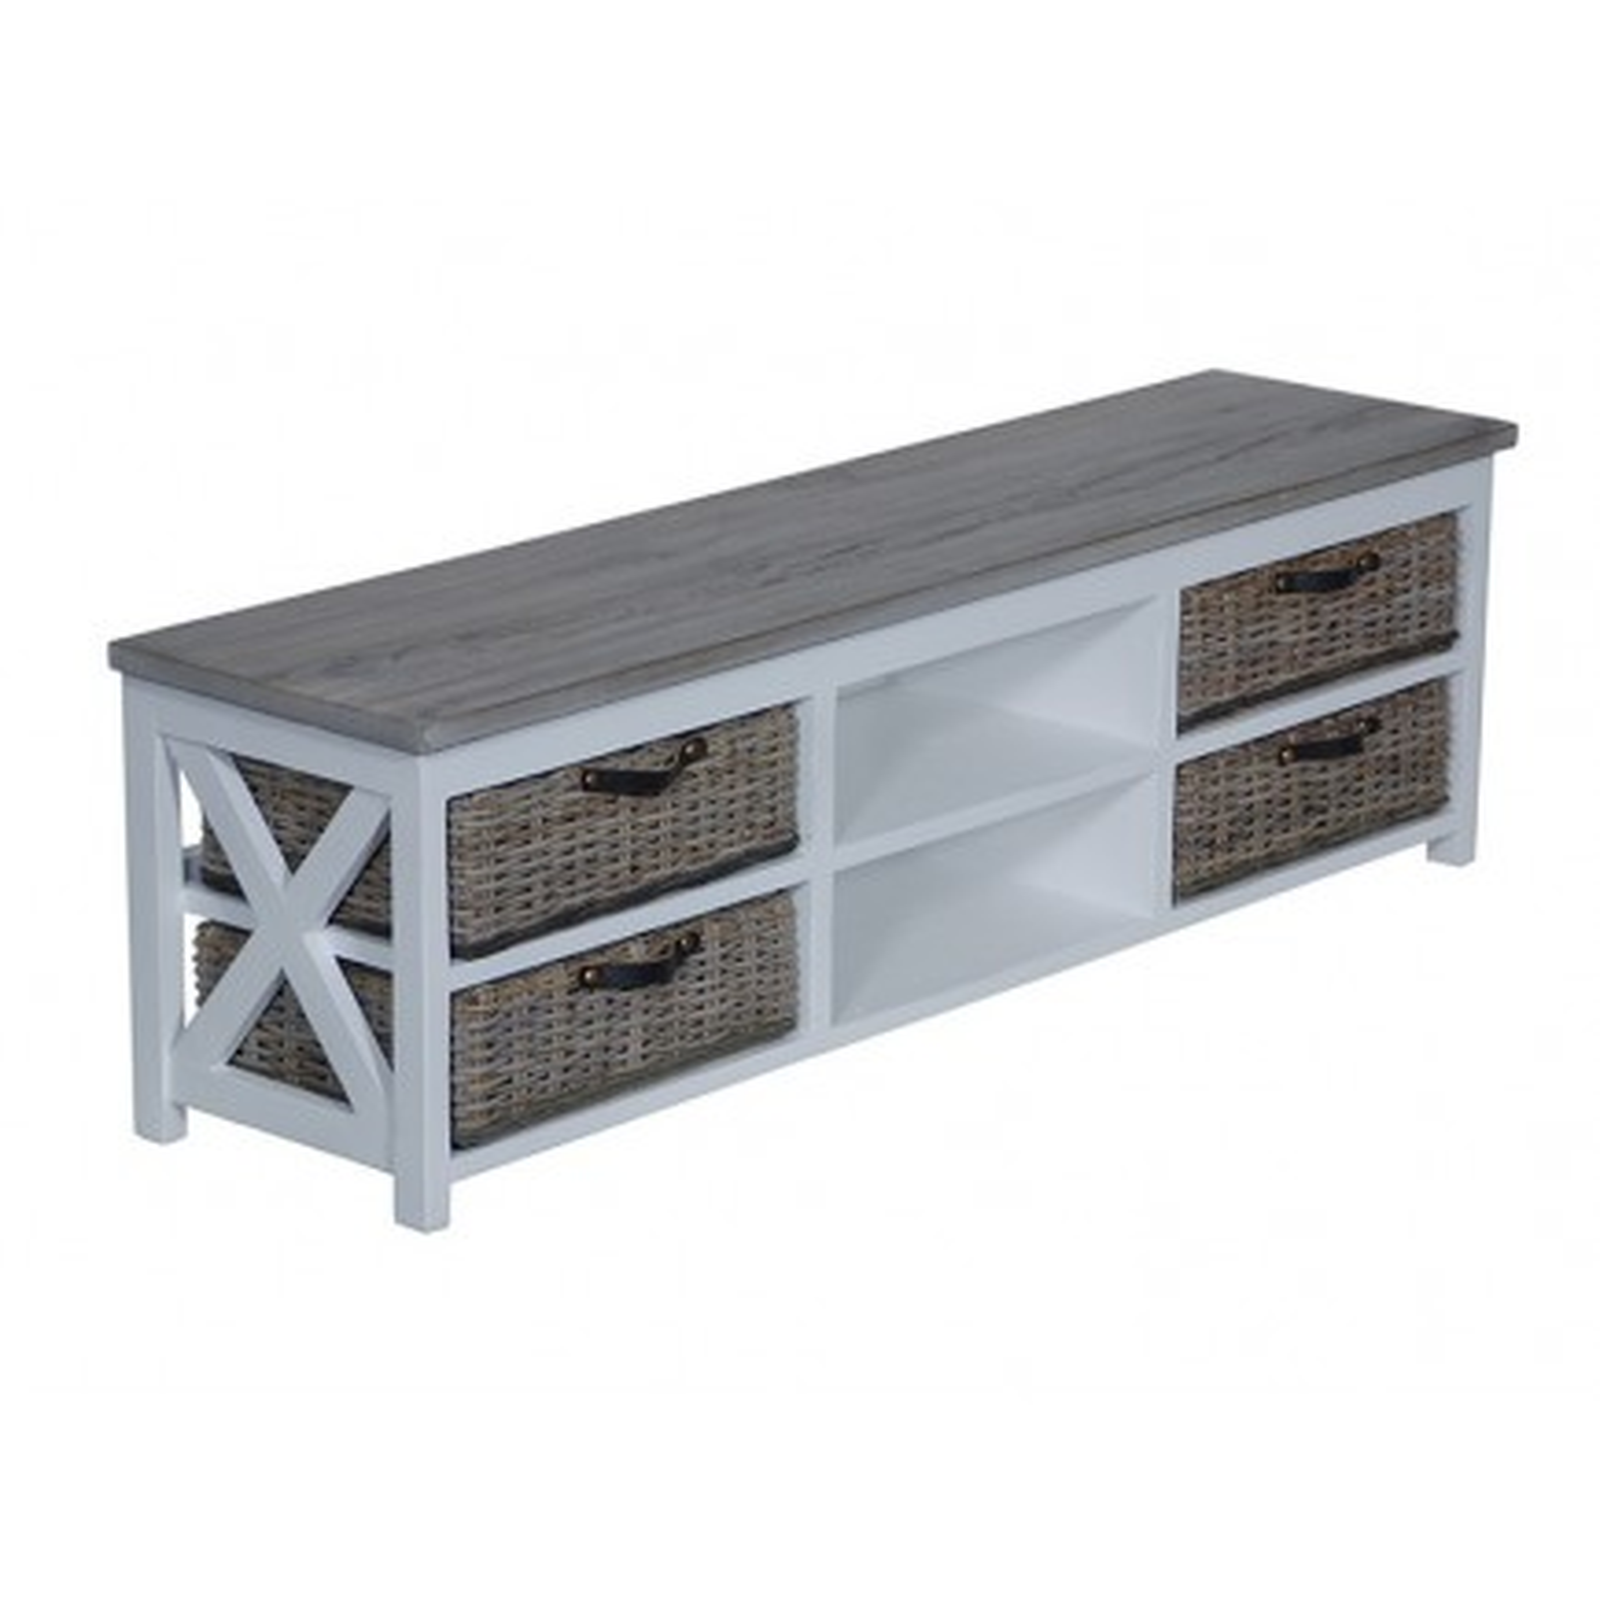 Meuble Tv Bokéo Manguier - meuble bois exotique